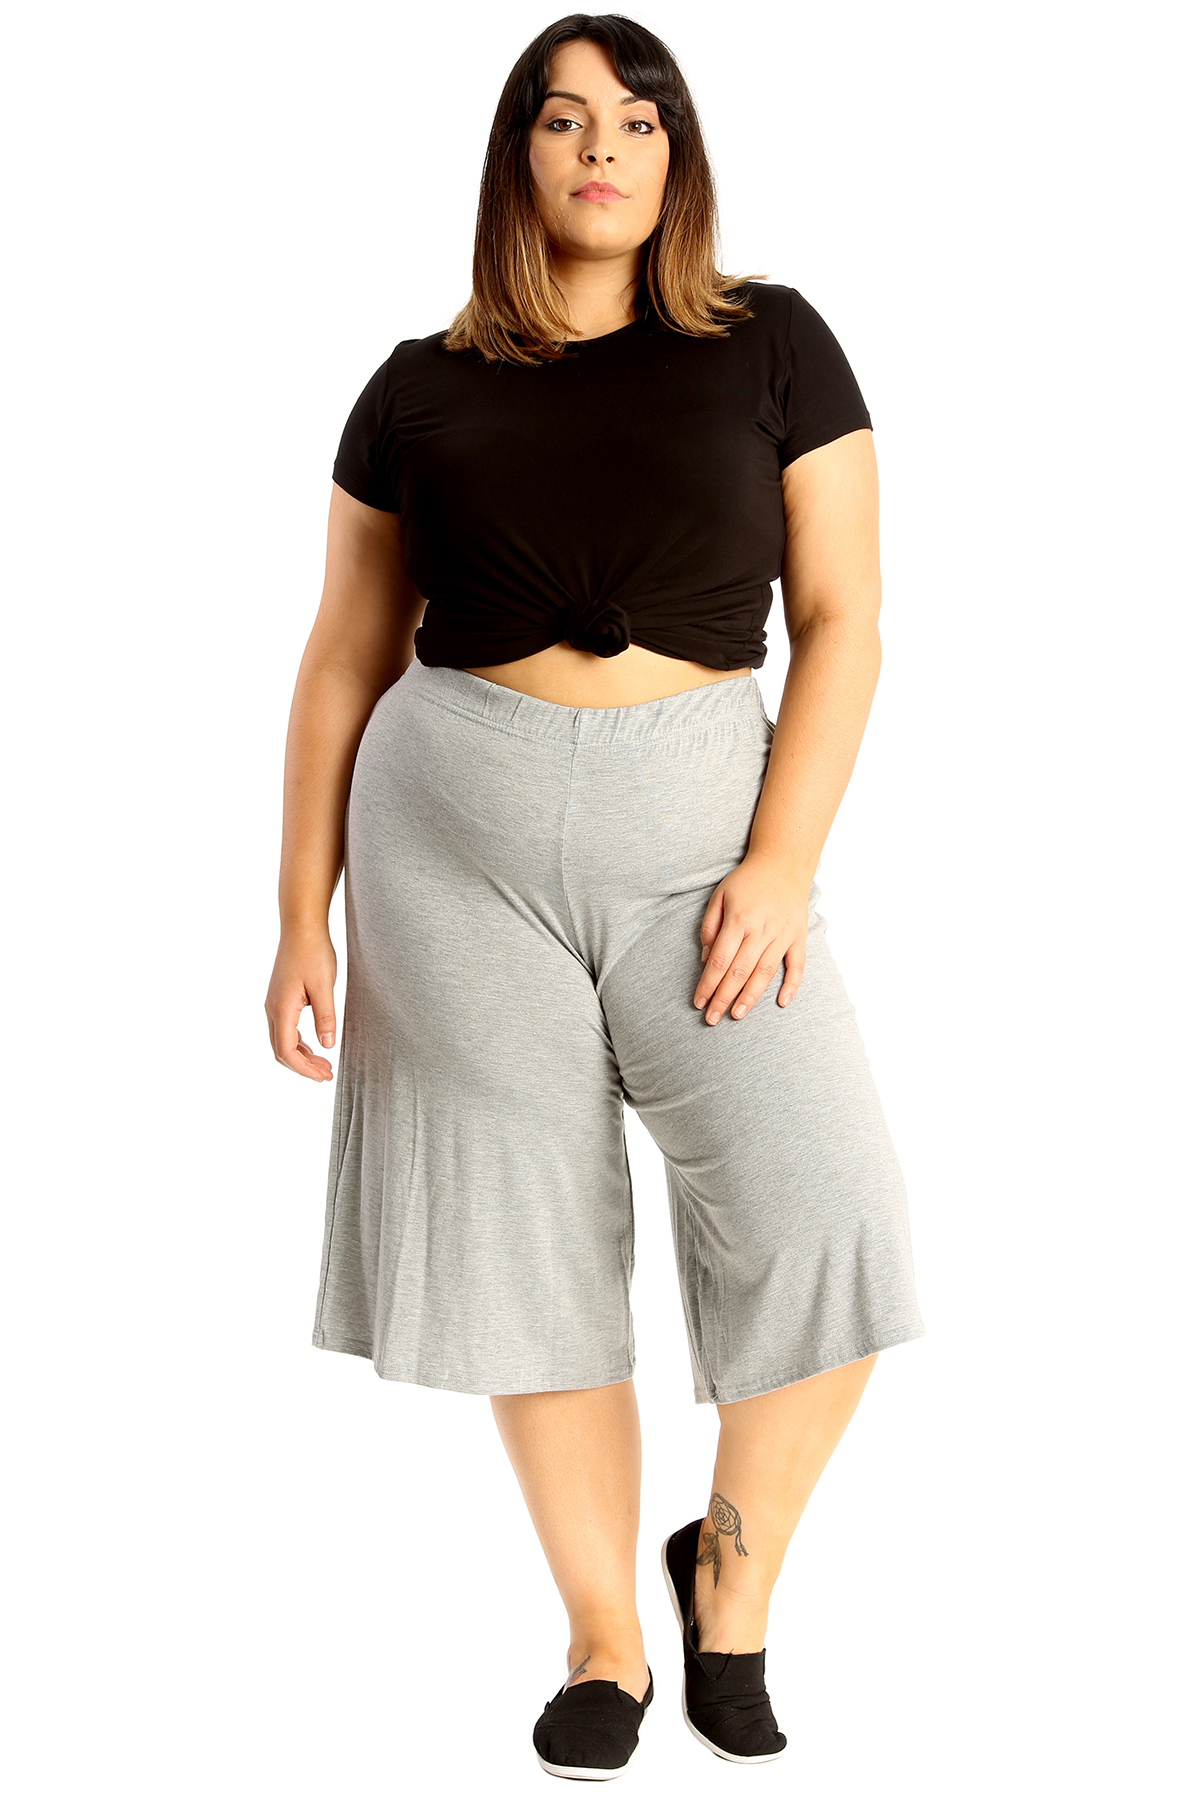 New-Womens-Plus-Size-Culottes-Ladies-Plain-Shorts-Palazzo-Elastic-Pants-Summer thumbnail 22